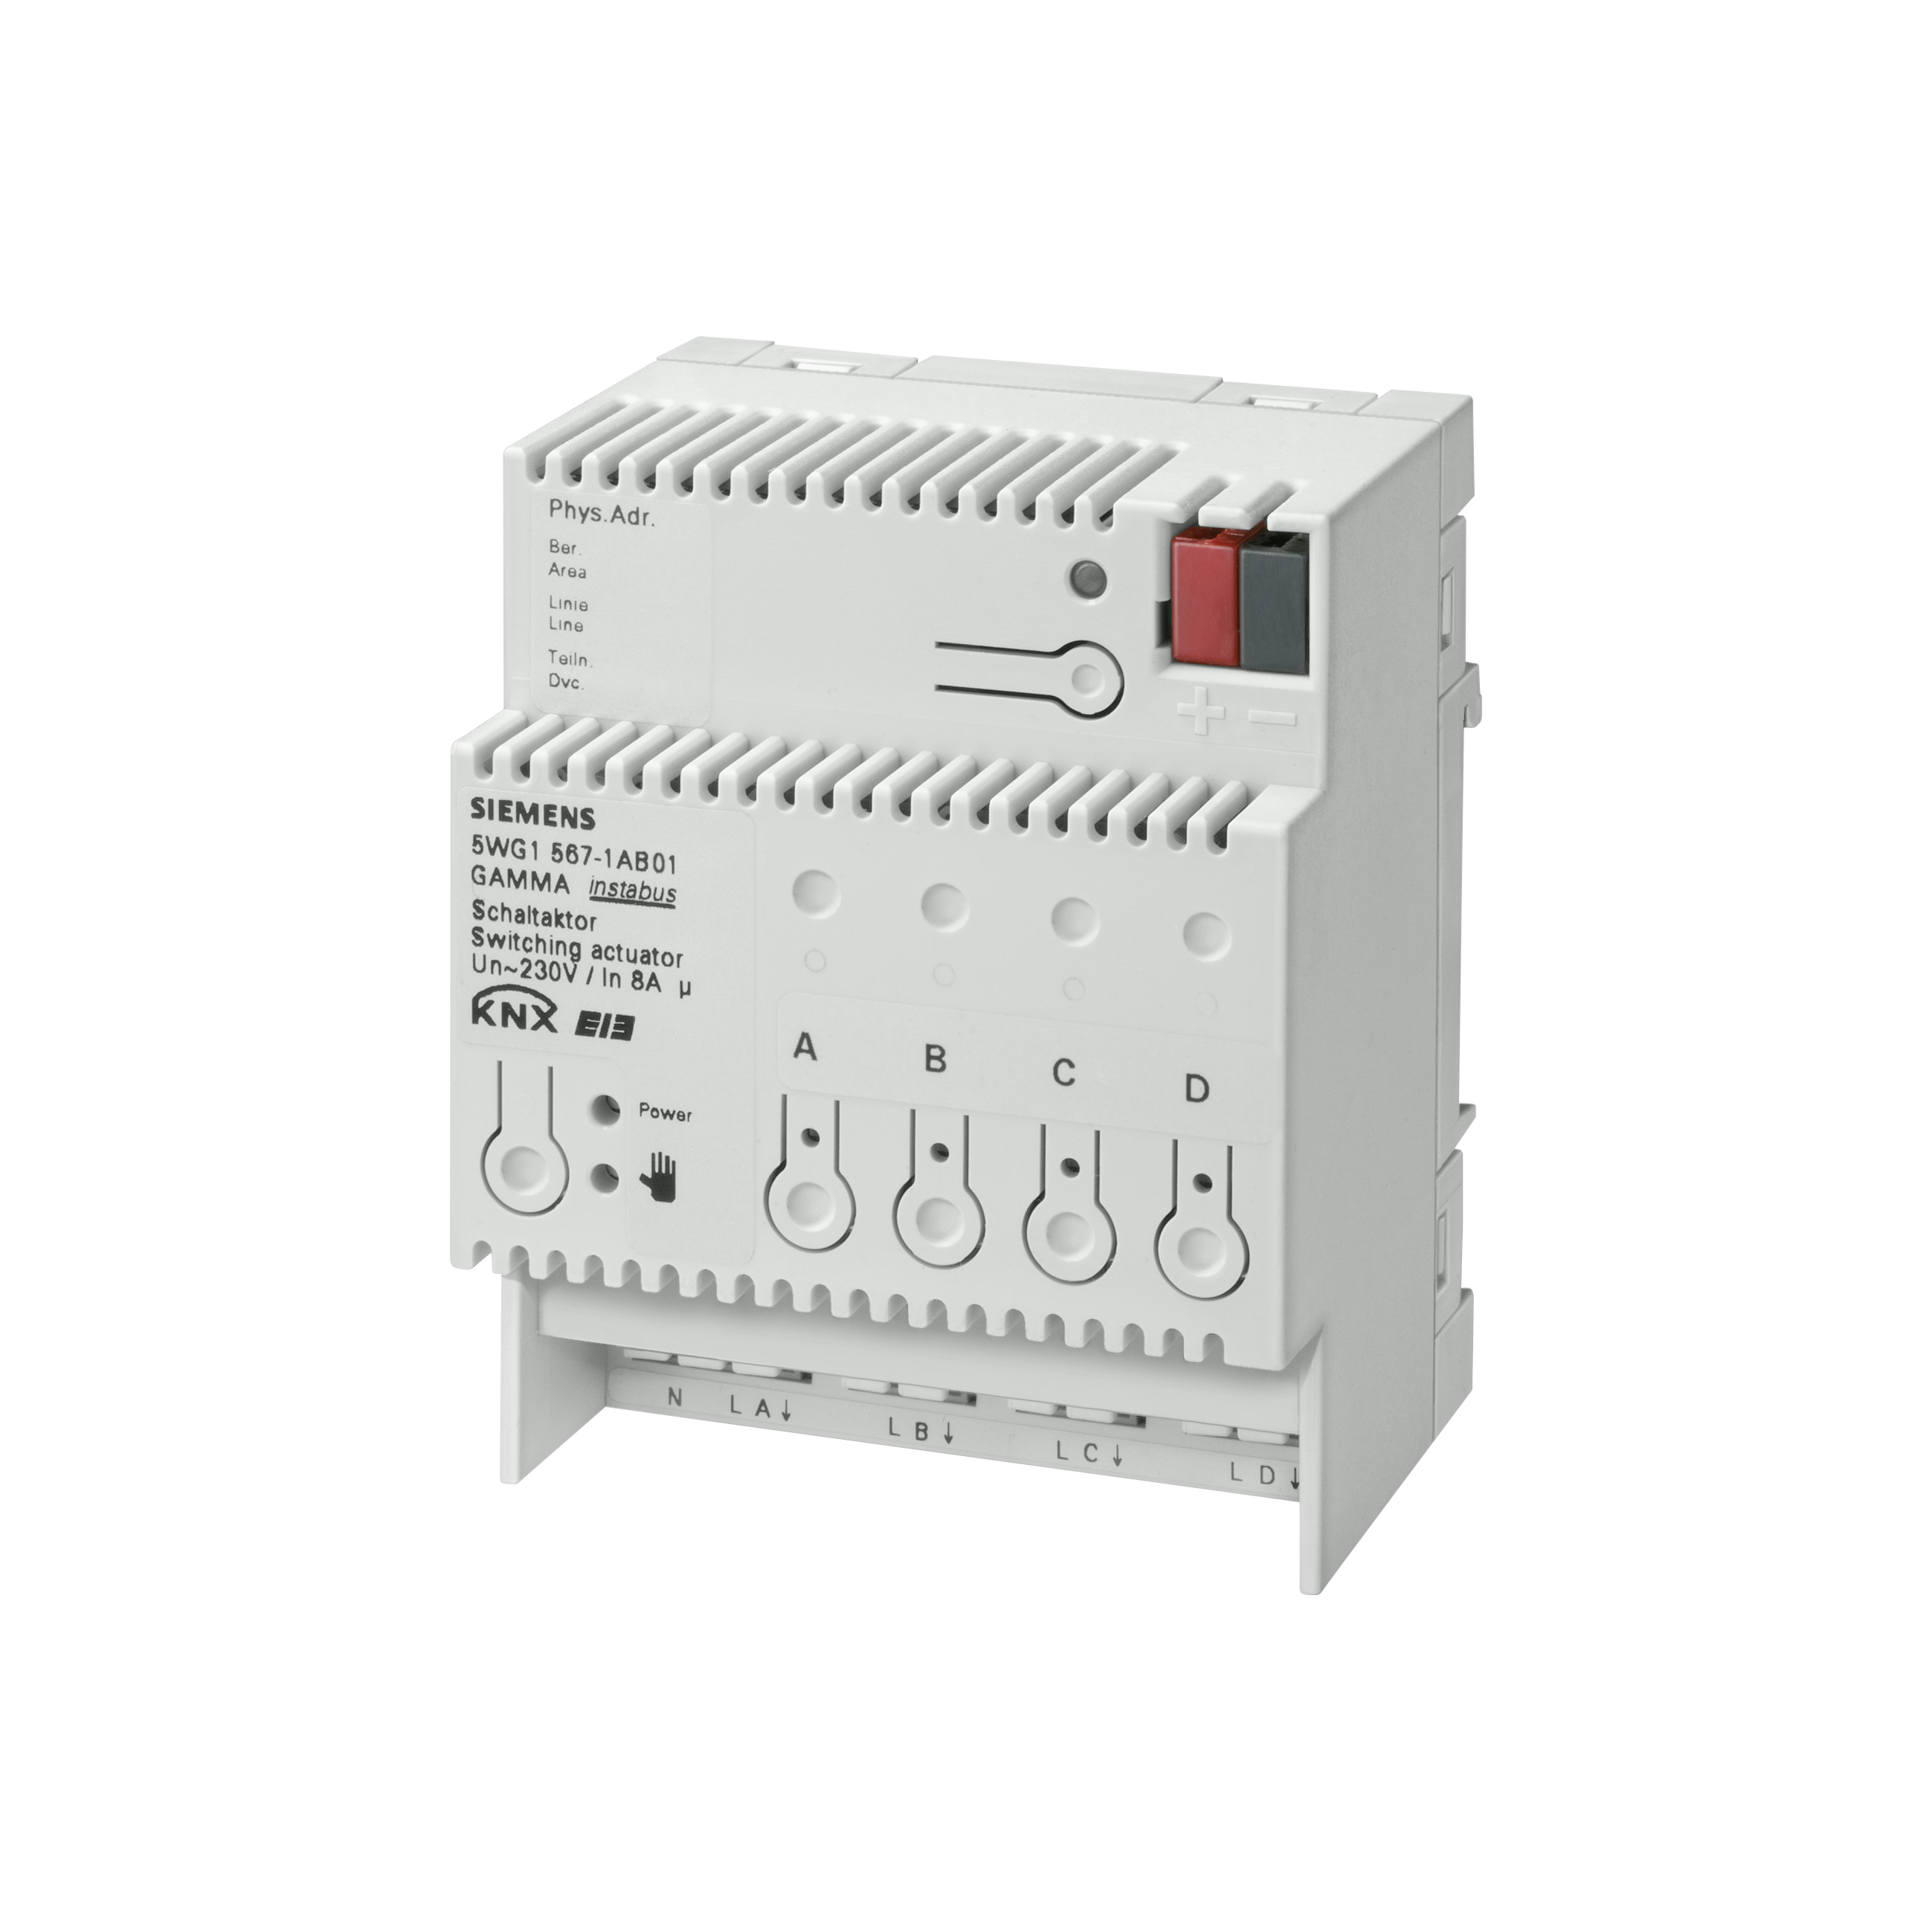 1 Stk Schaltaktor 4 x AC 230 V, 8 A KX5671AB01